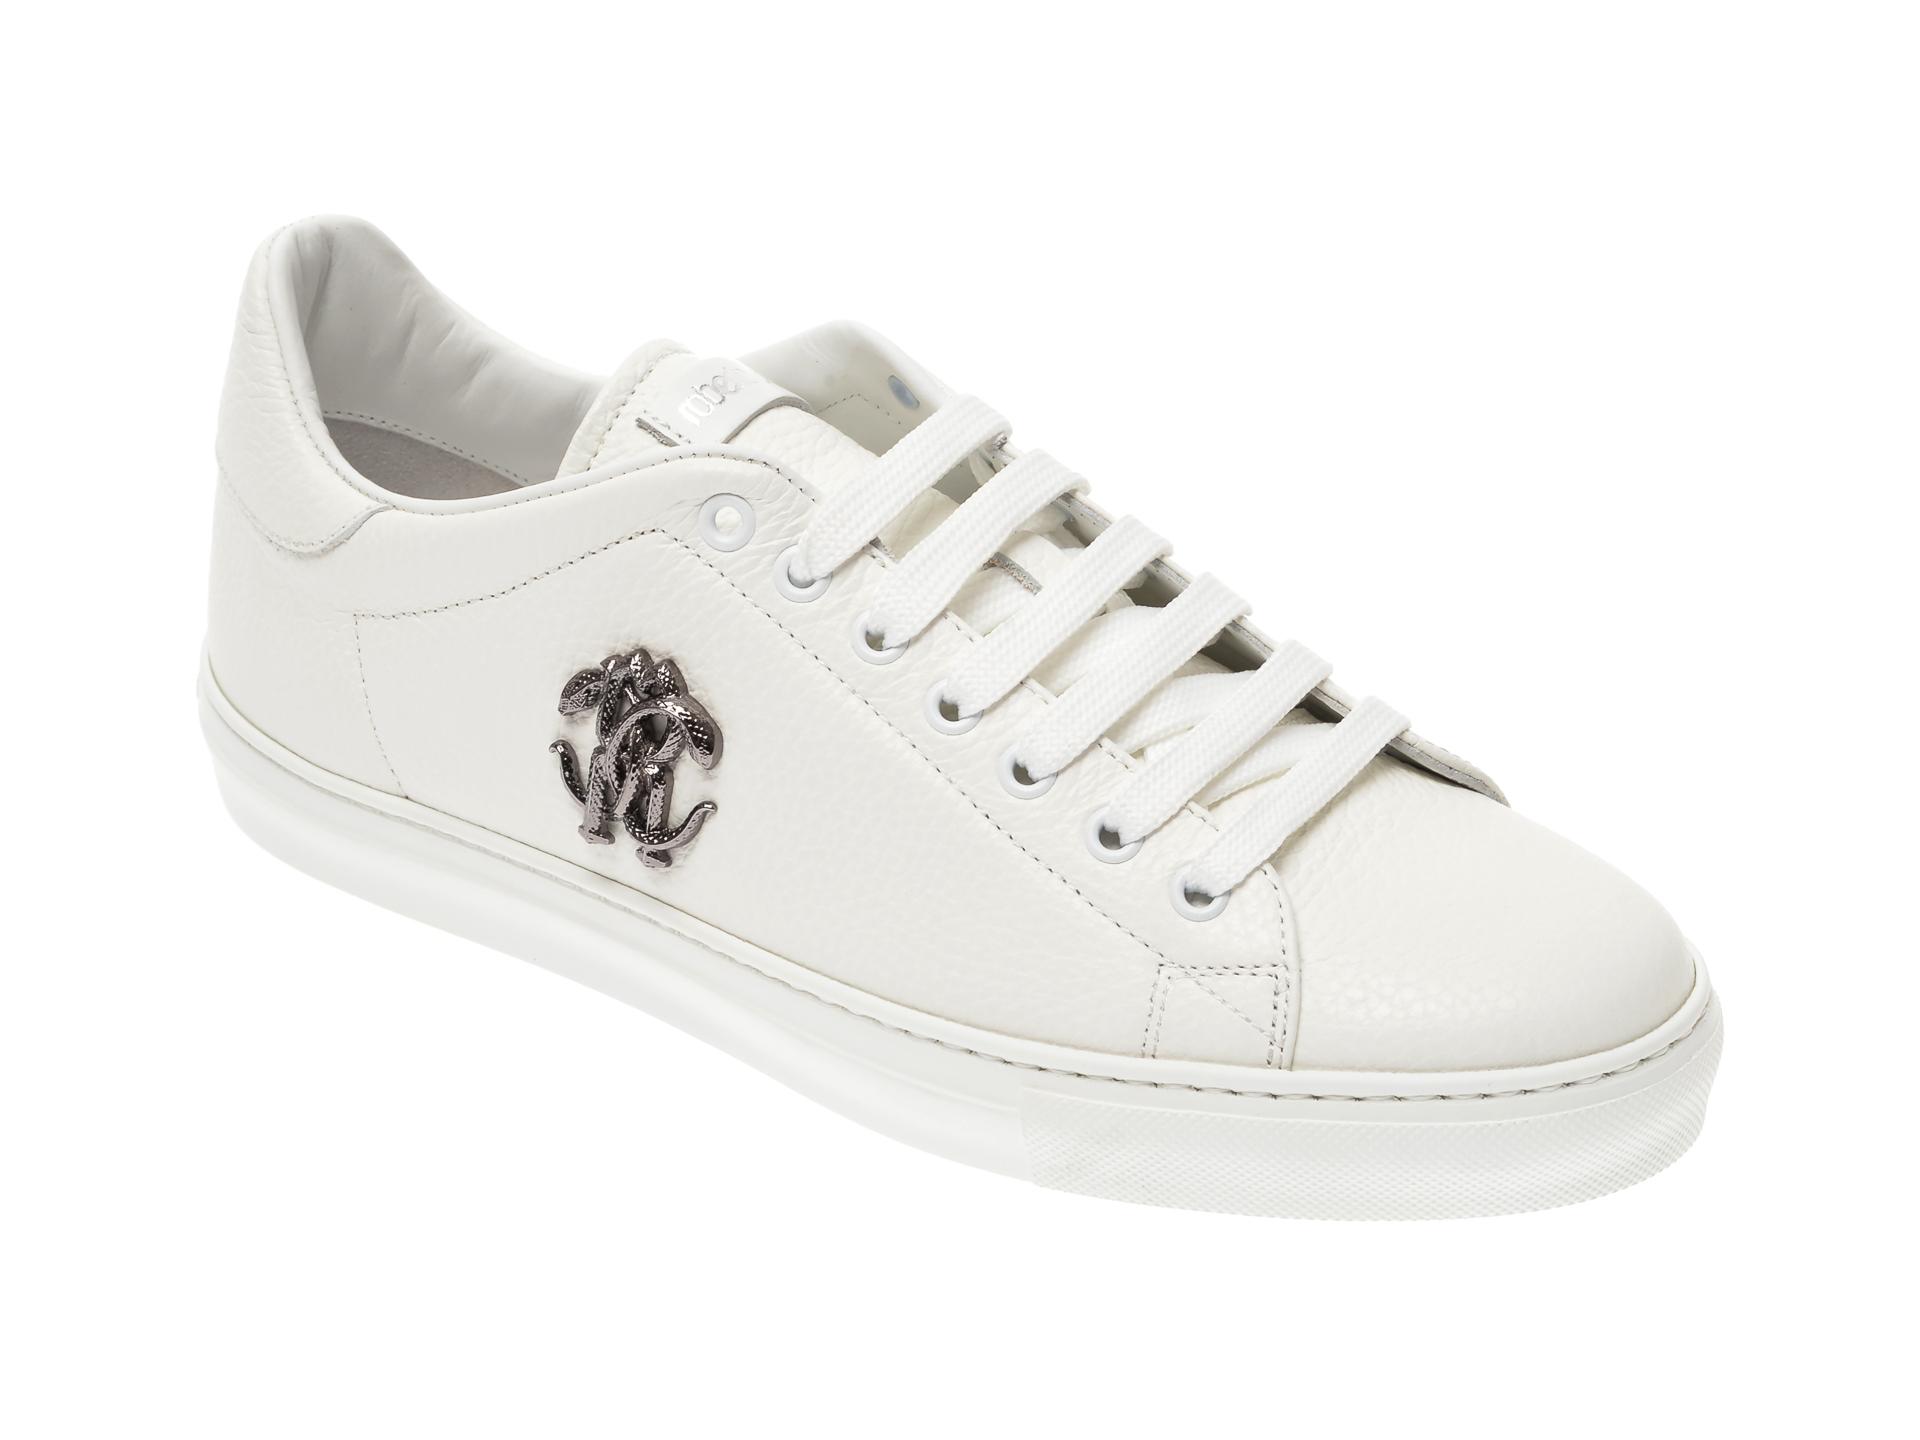 Pantofi ROBERTO CAVALLI albi, 1004, din piele naturala imagine